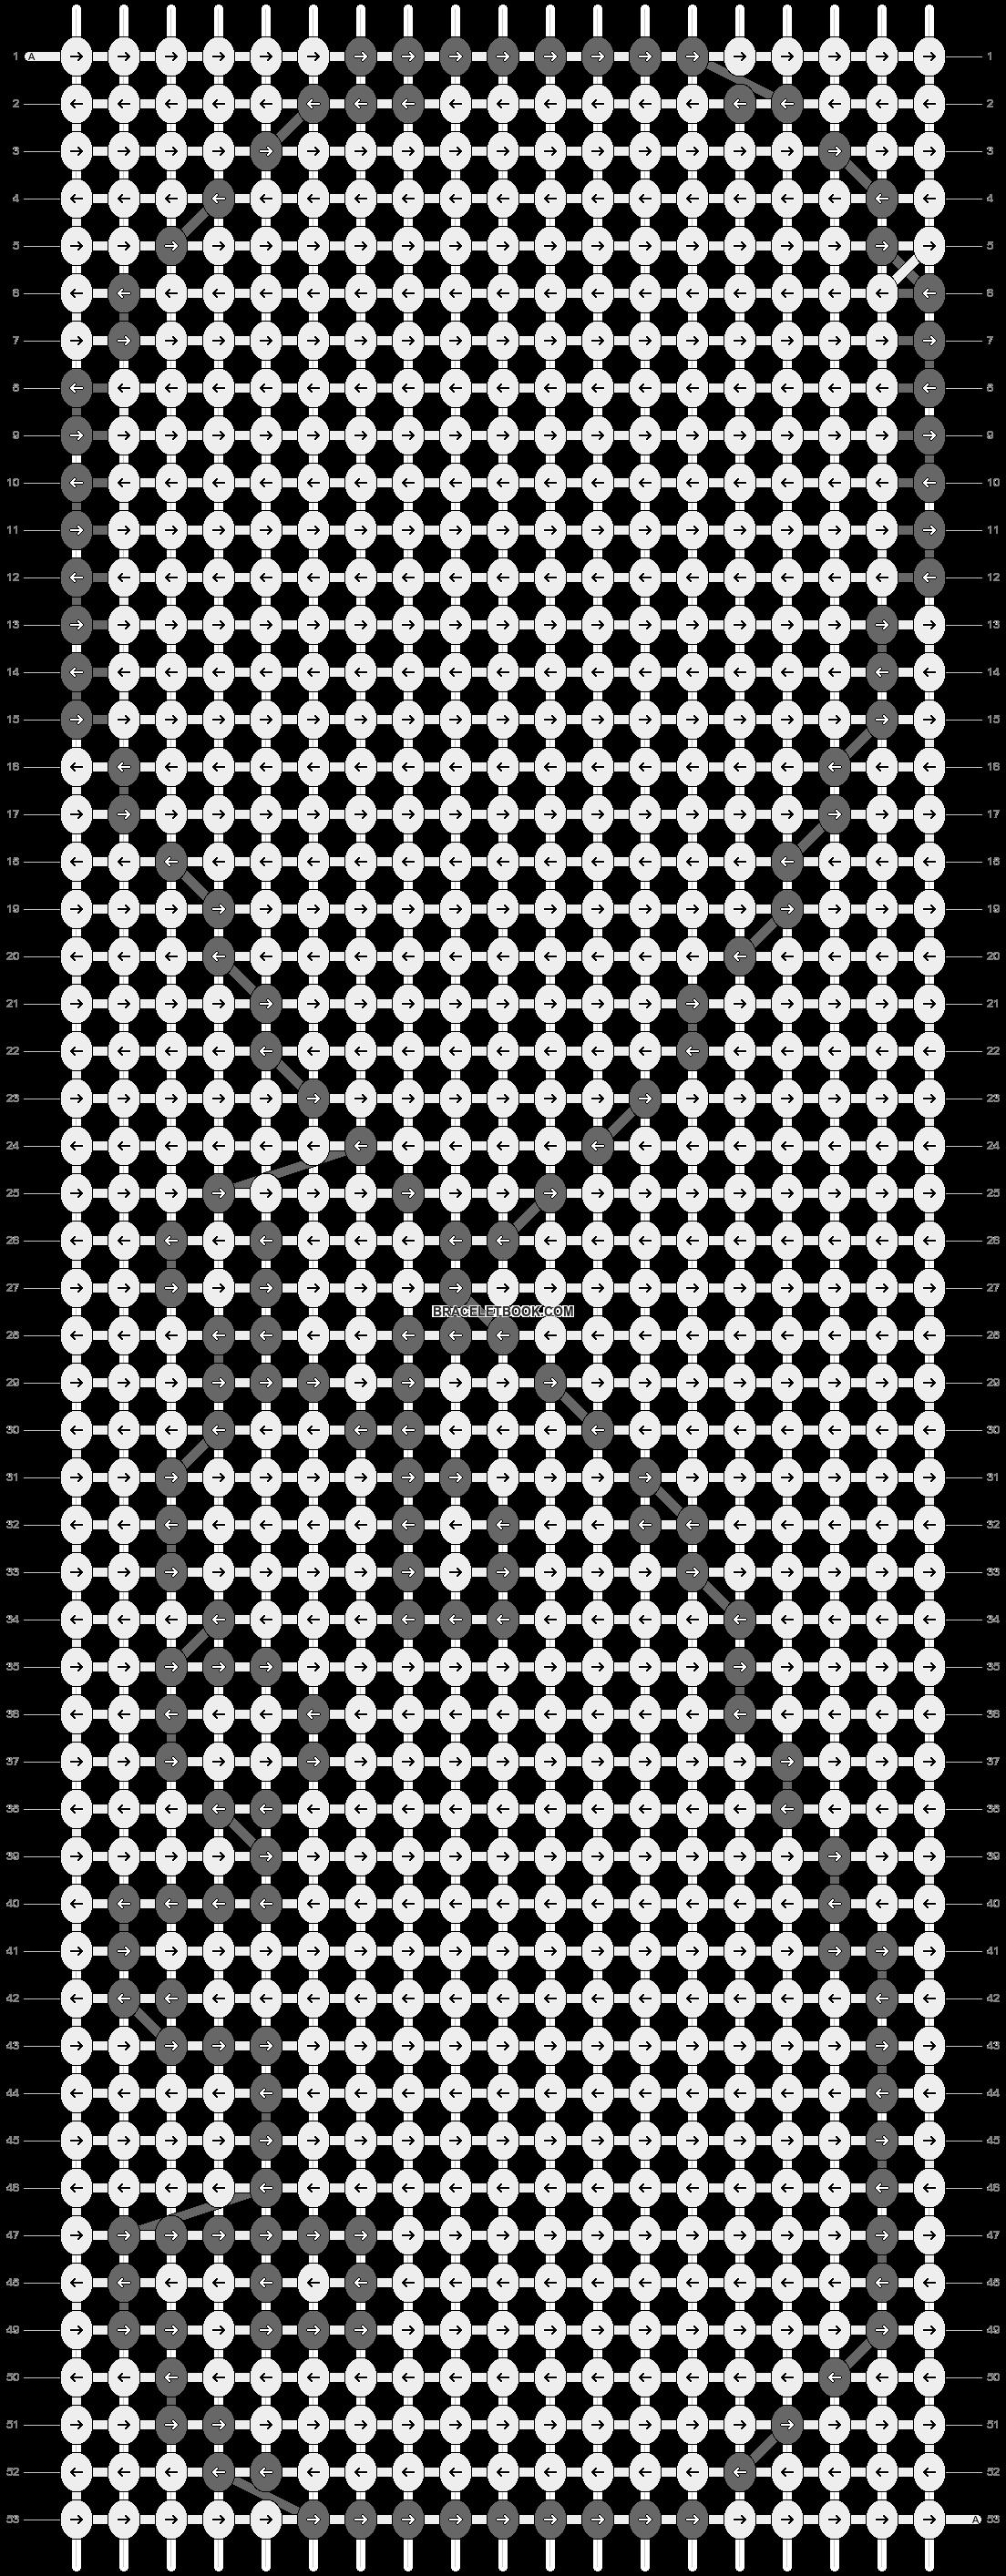 Alpha Pattern #13468 added by chey1470